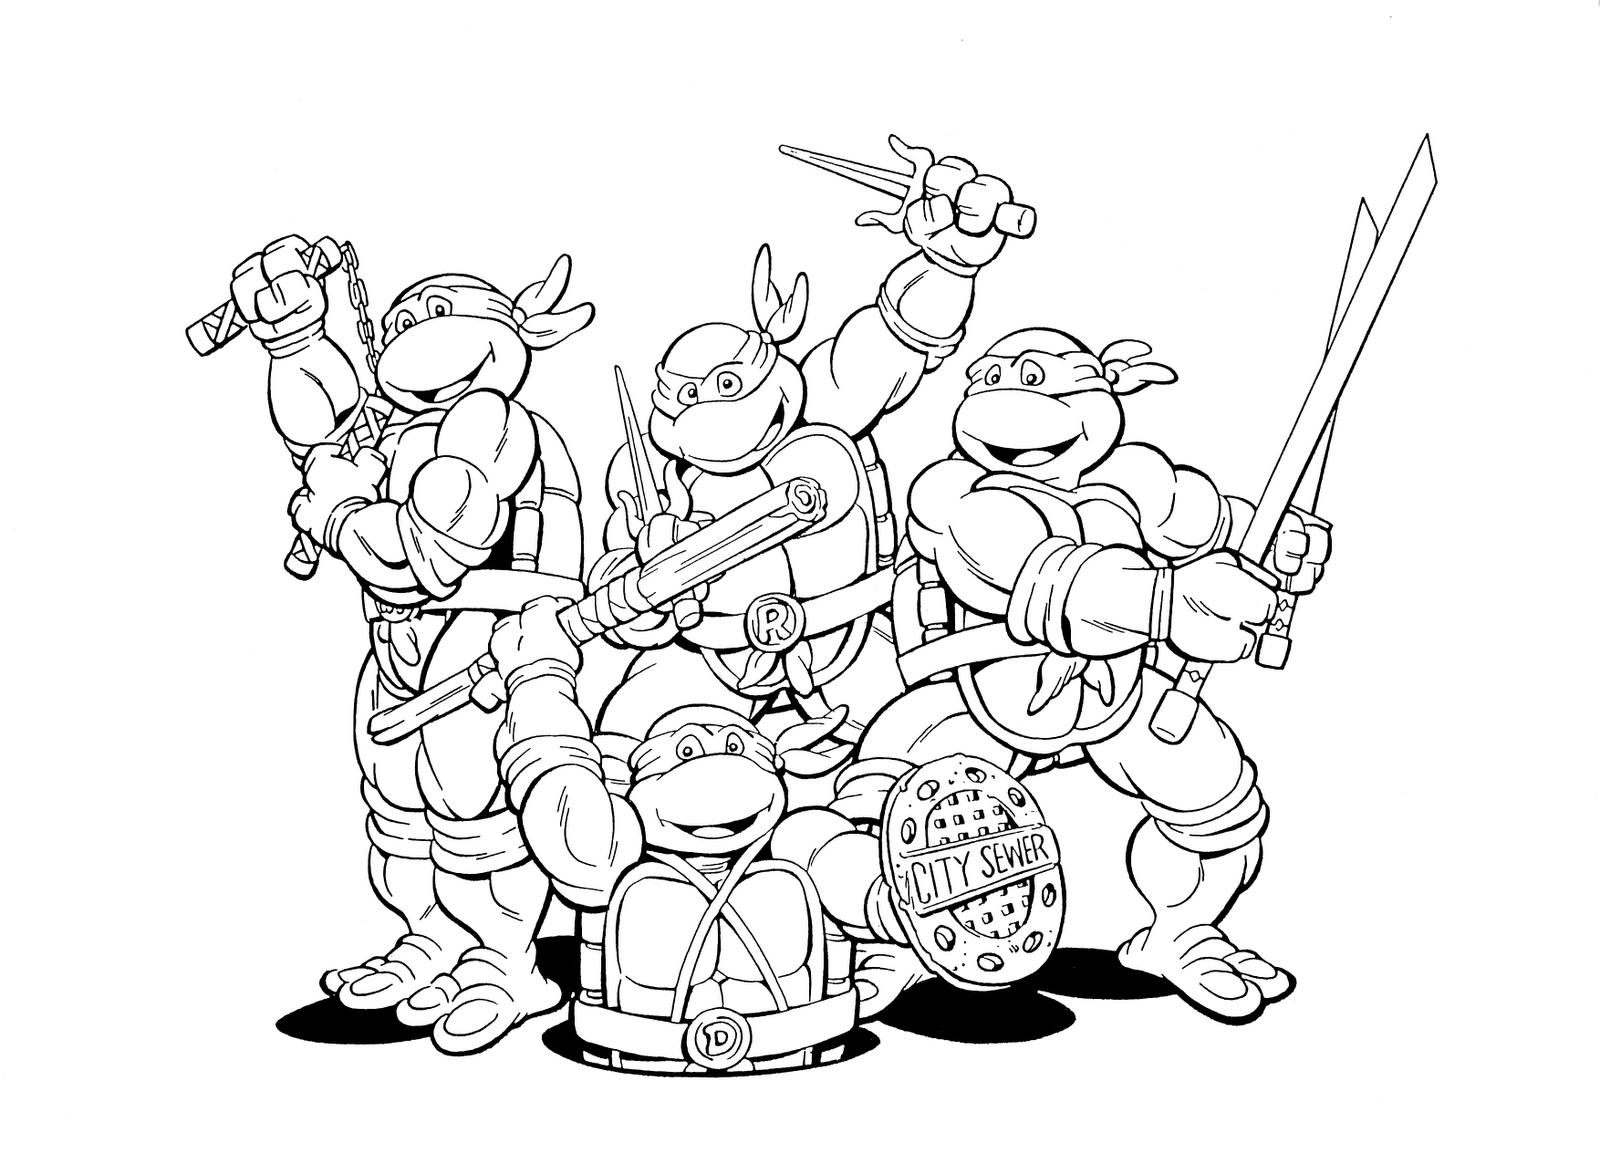 1600x1164 Mutant Ninja Turtles Coloring Pages Chloe's Birthday